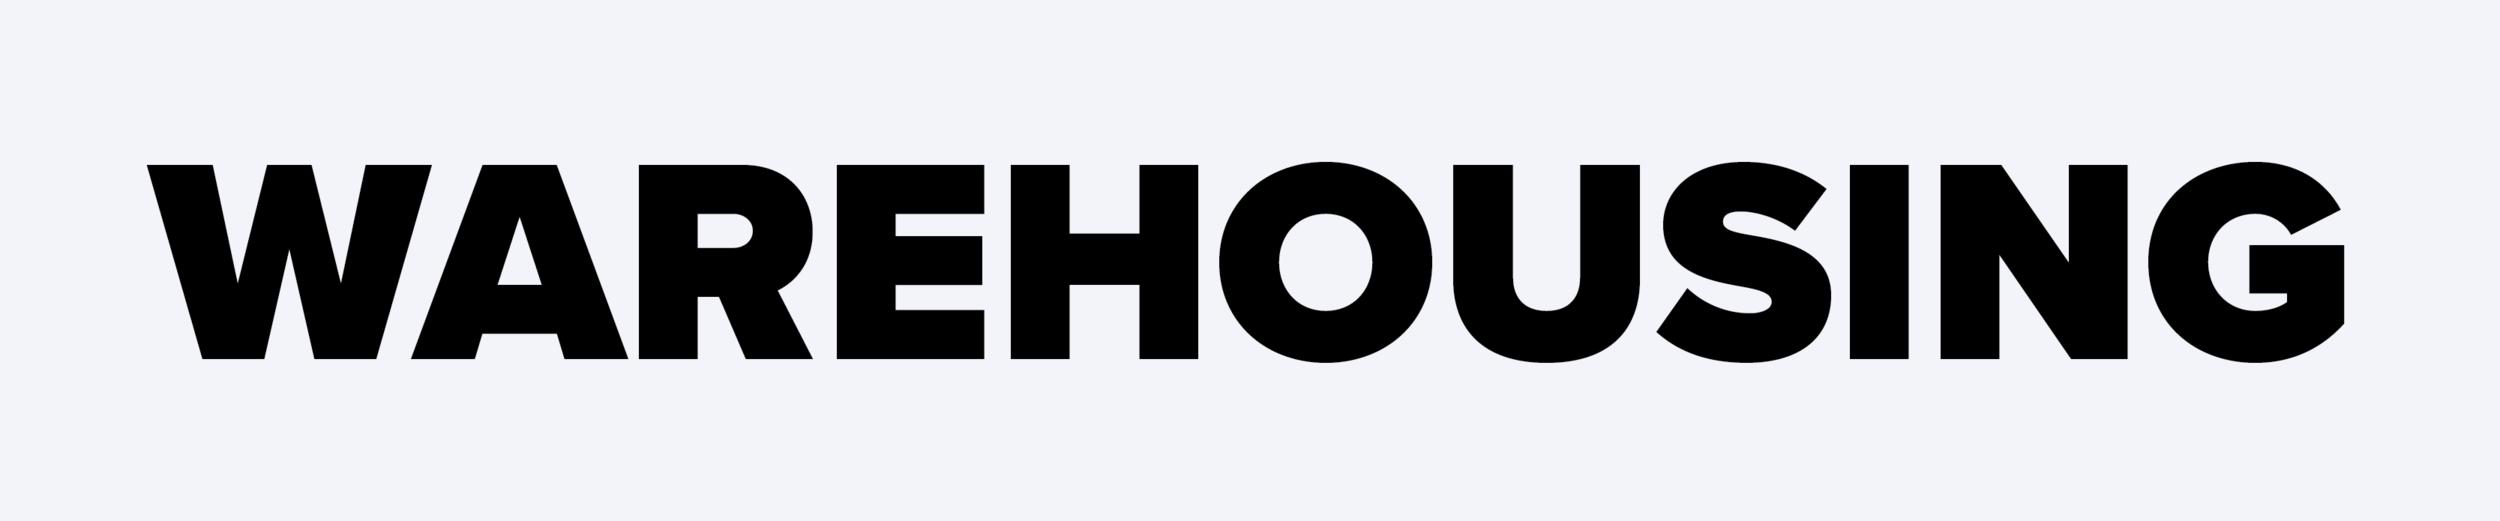 Warehousing Title-01.png